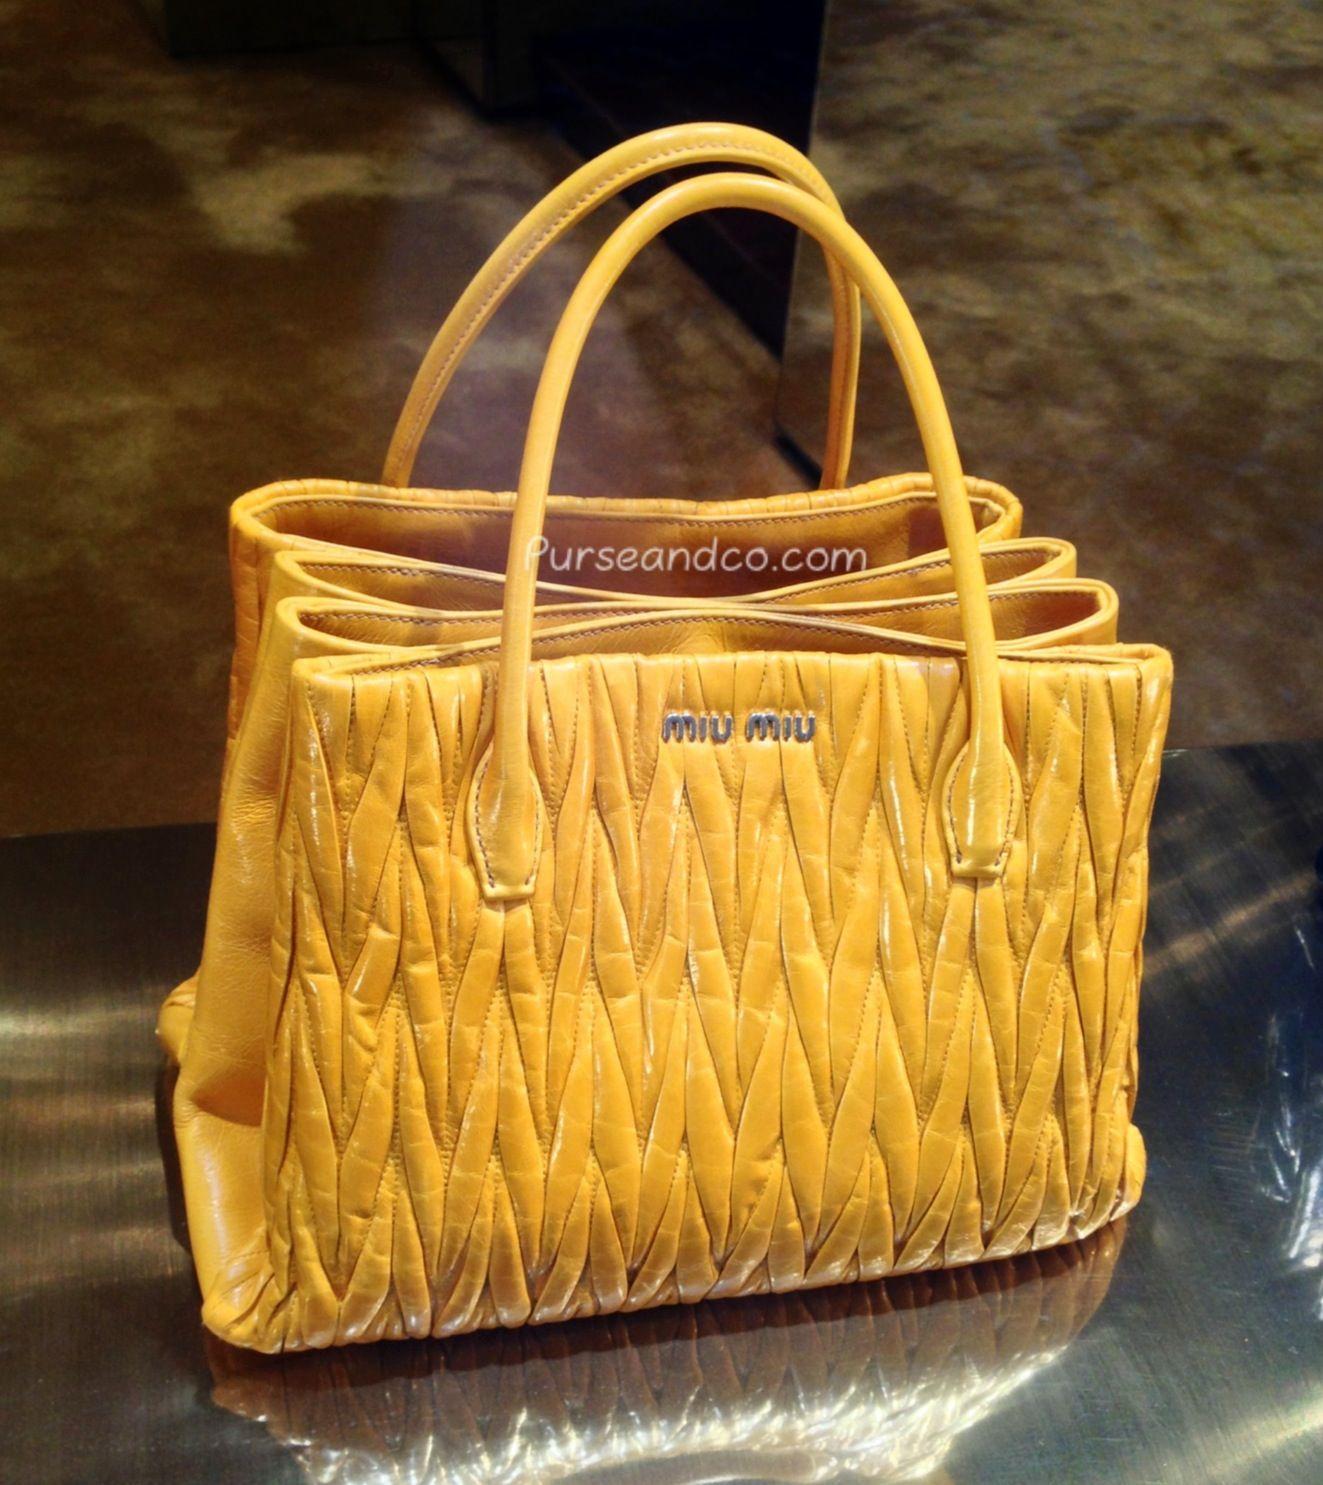 Miu Miu spring / summer 2013 bags collection - #miumiu #bags #borse